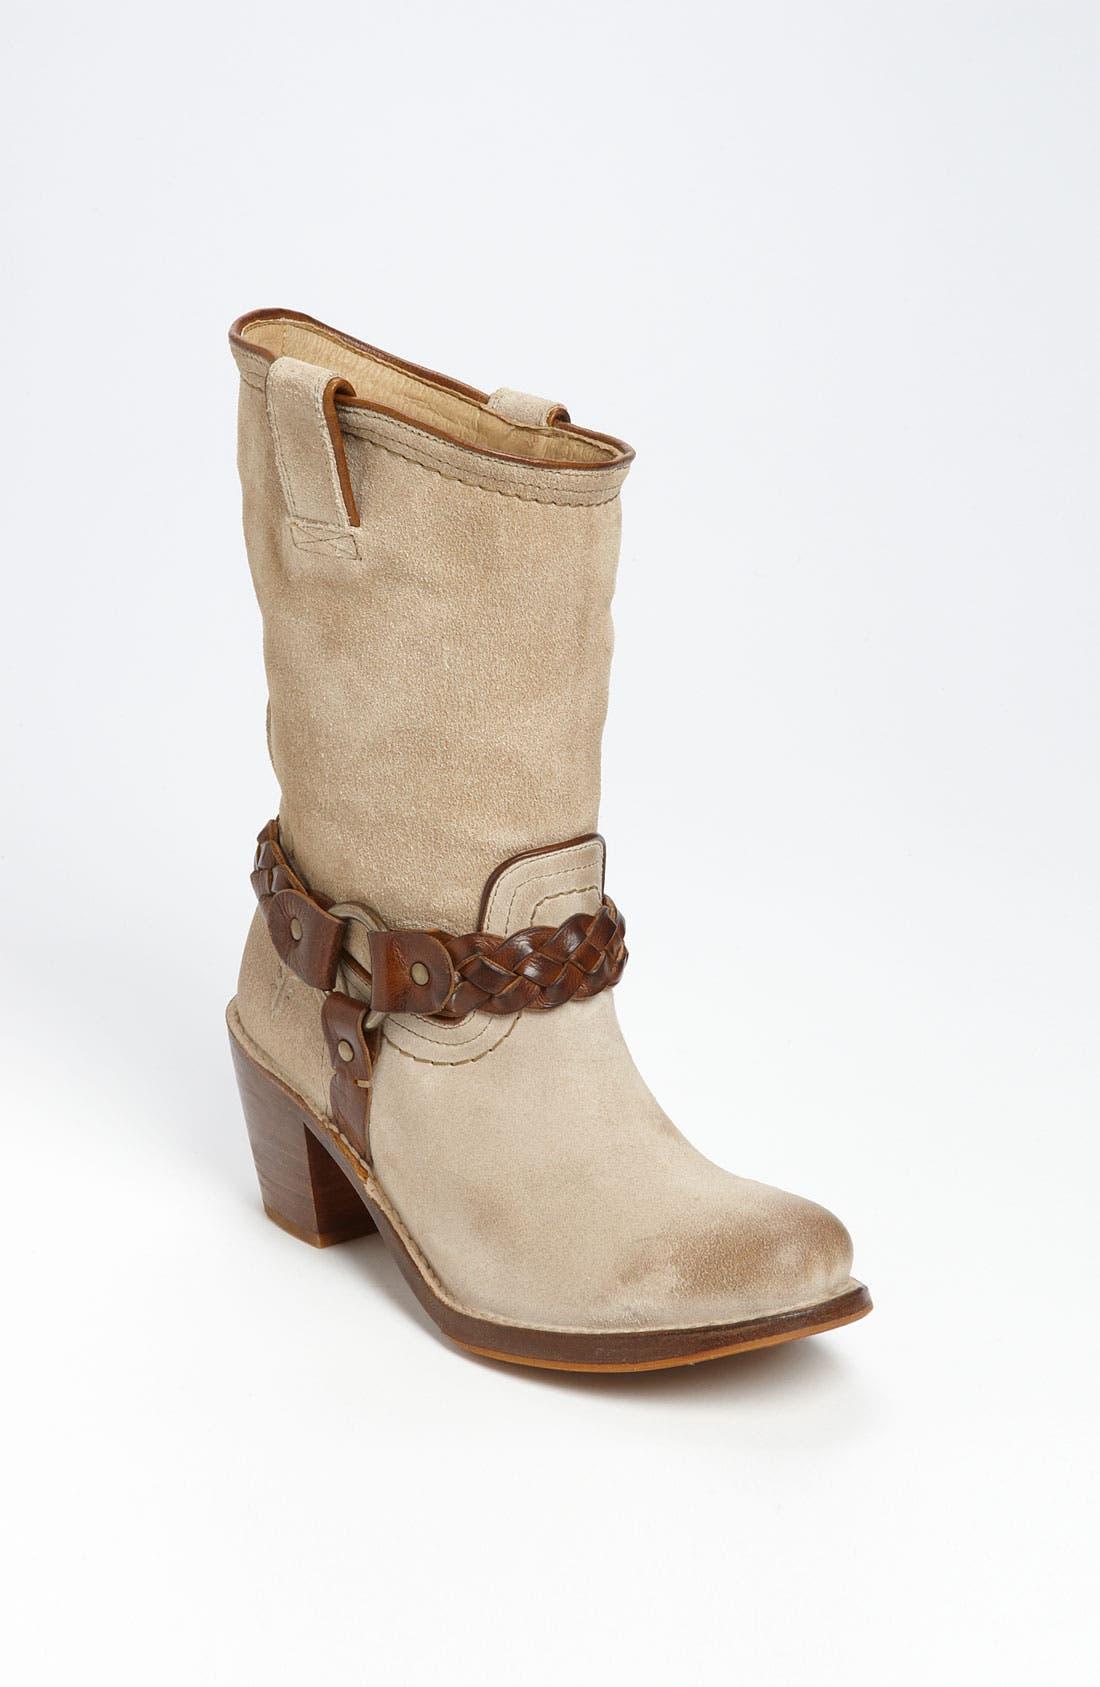 Main Image - Frye 'Carmen' Braided Harness Boot